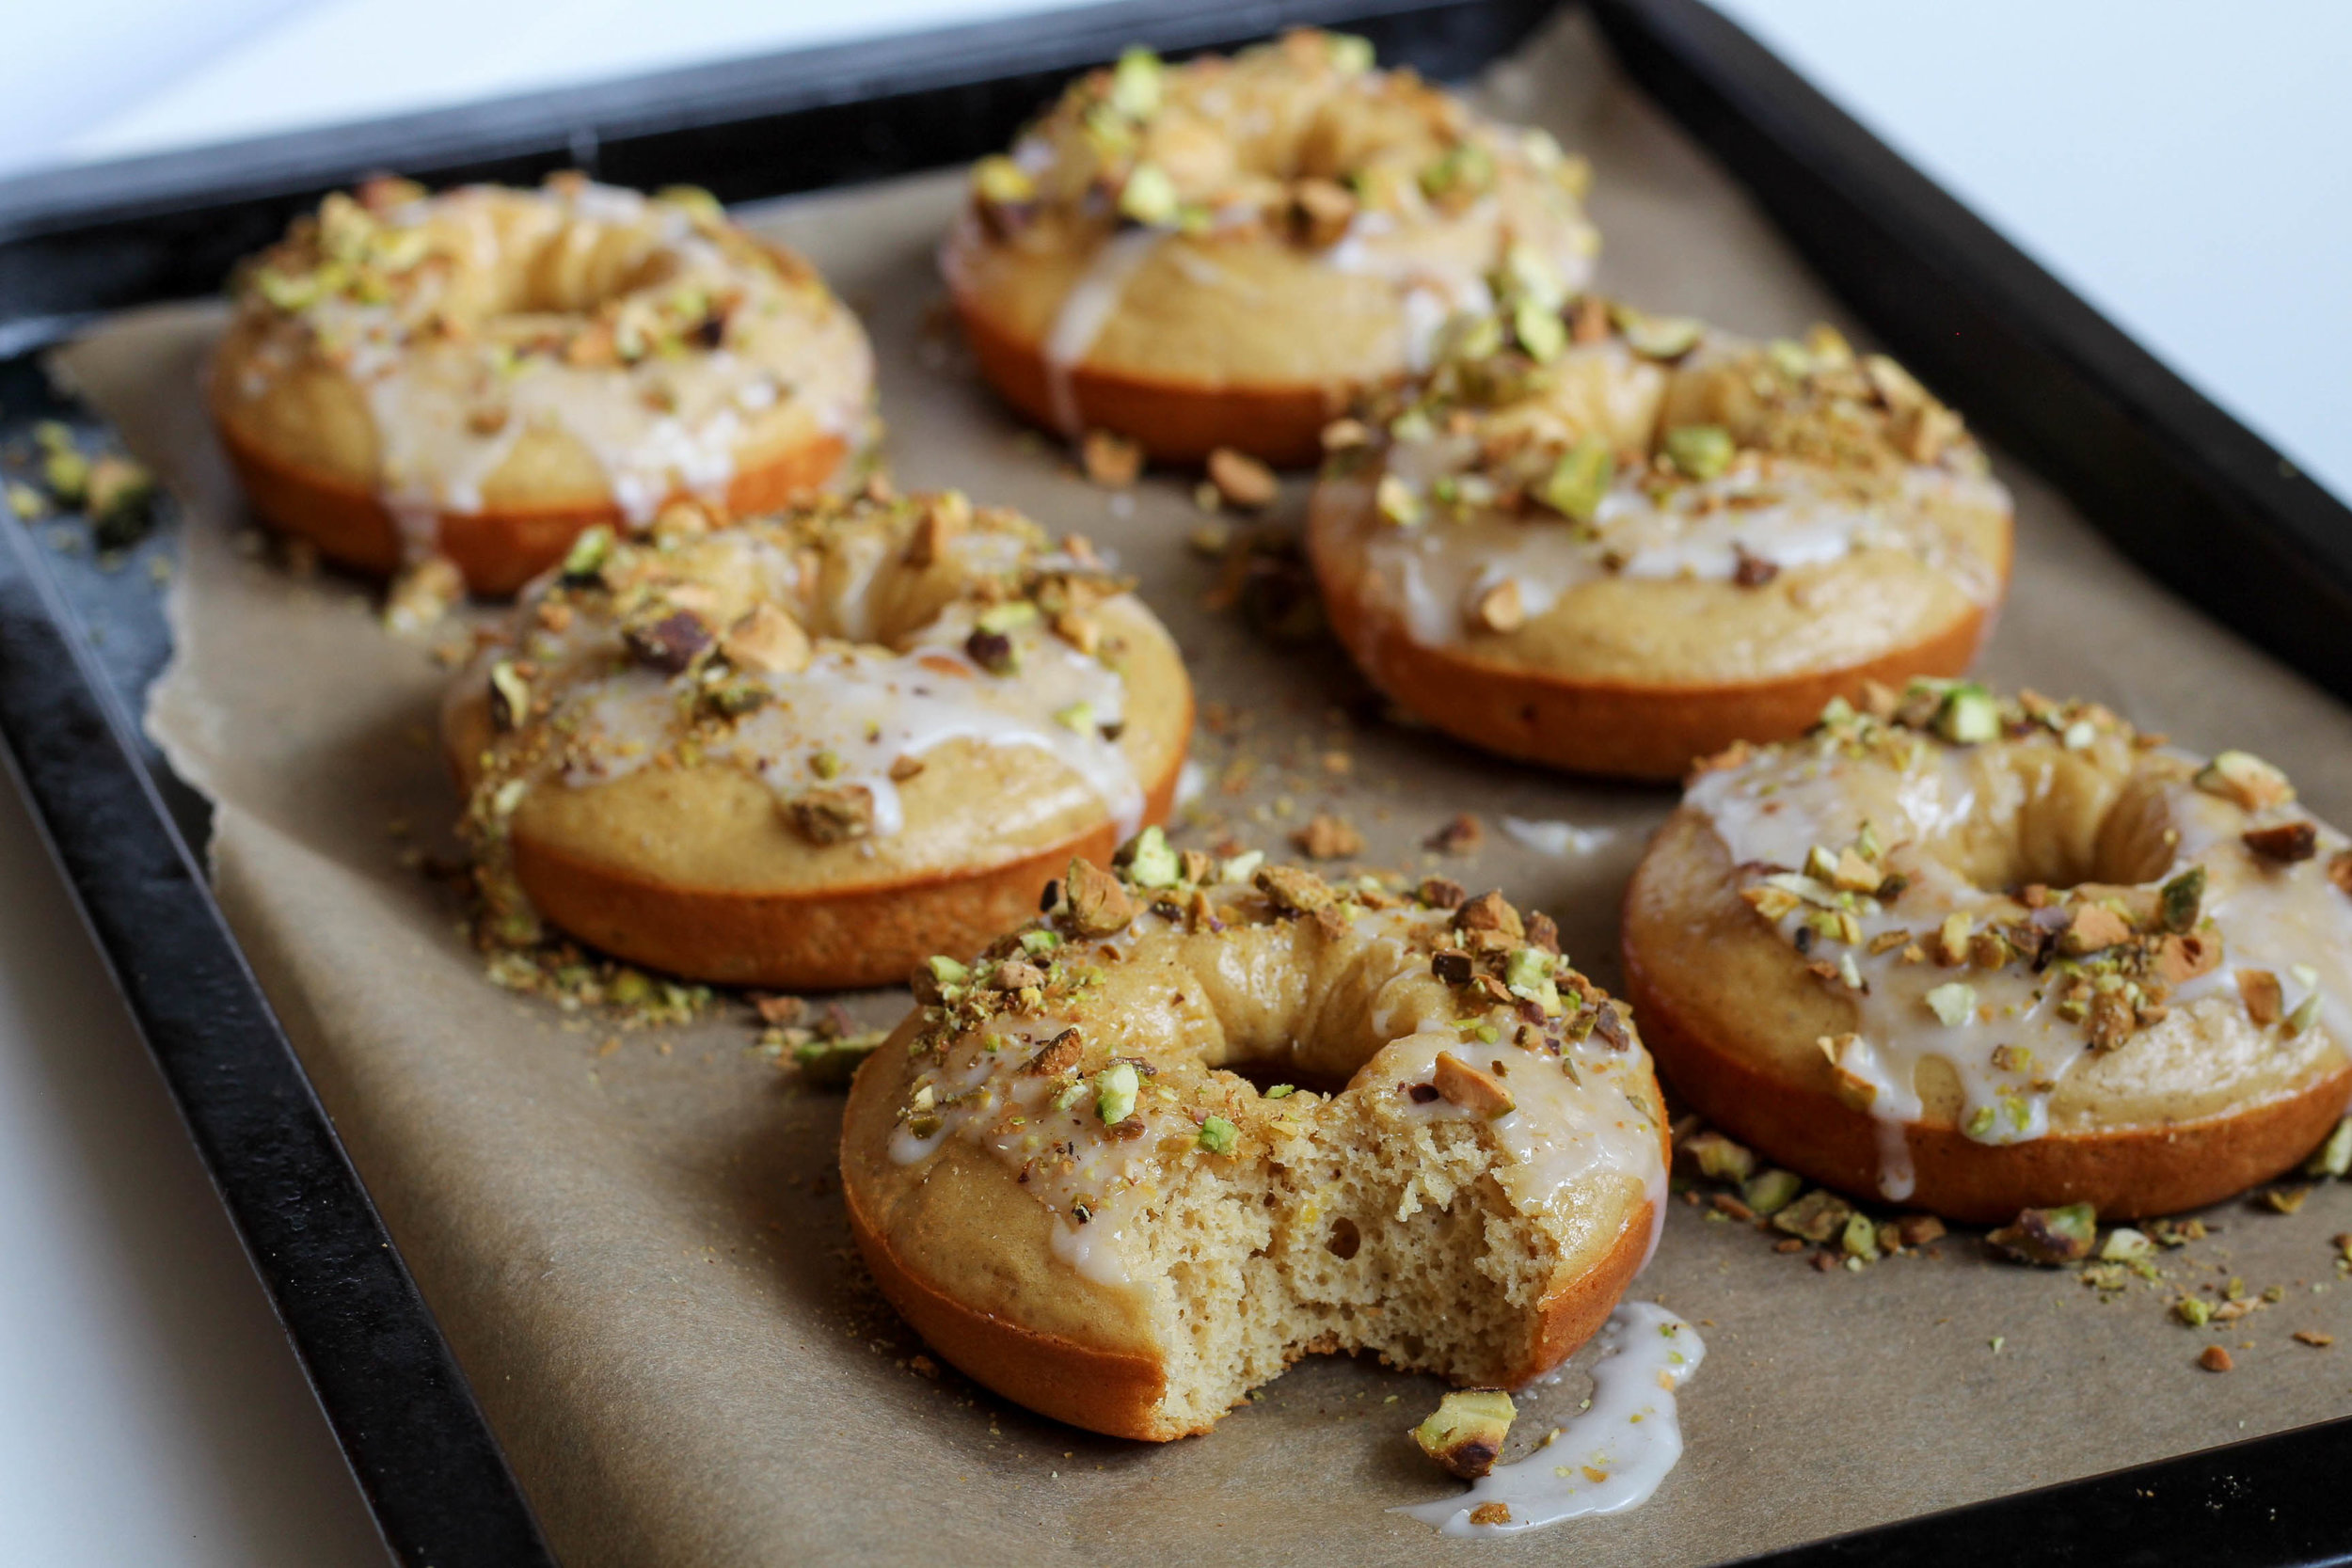 Lemon Pistachio Donuts | My Engineered Nutrition